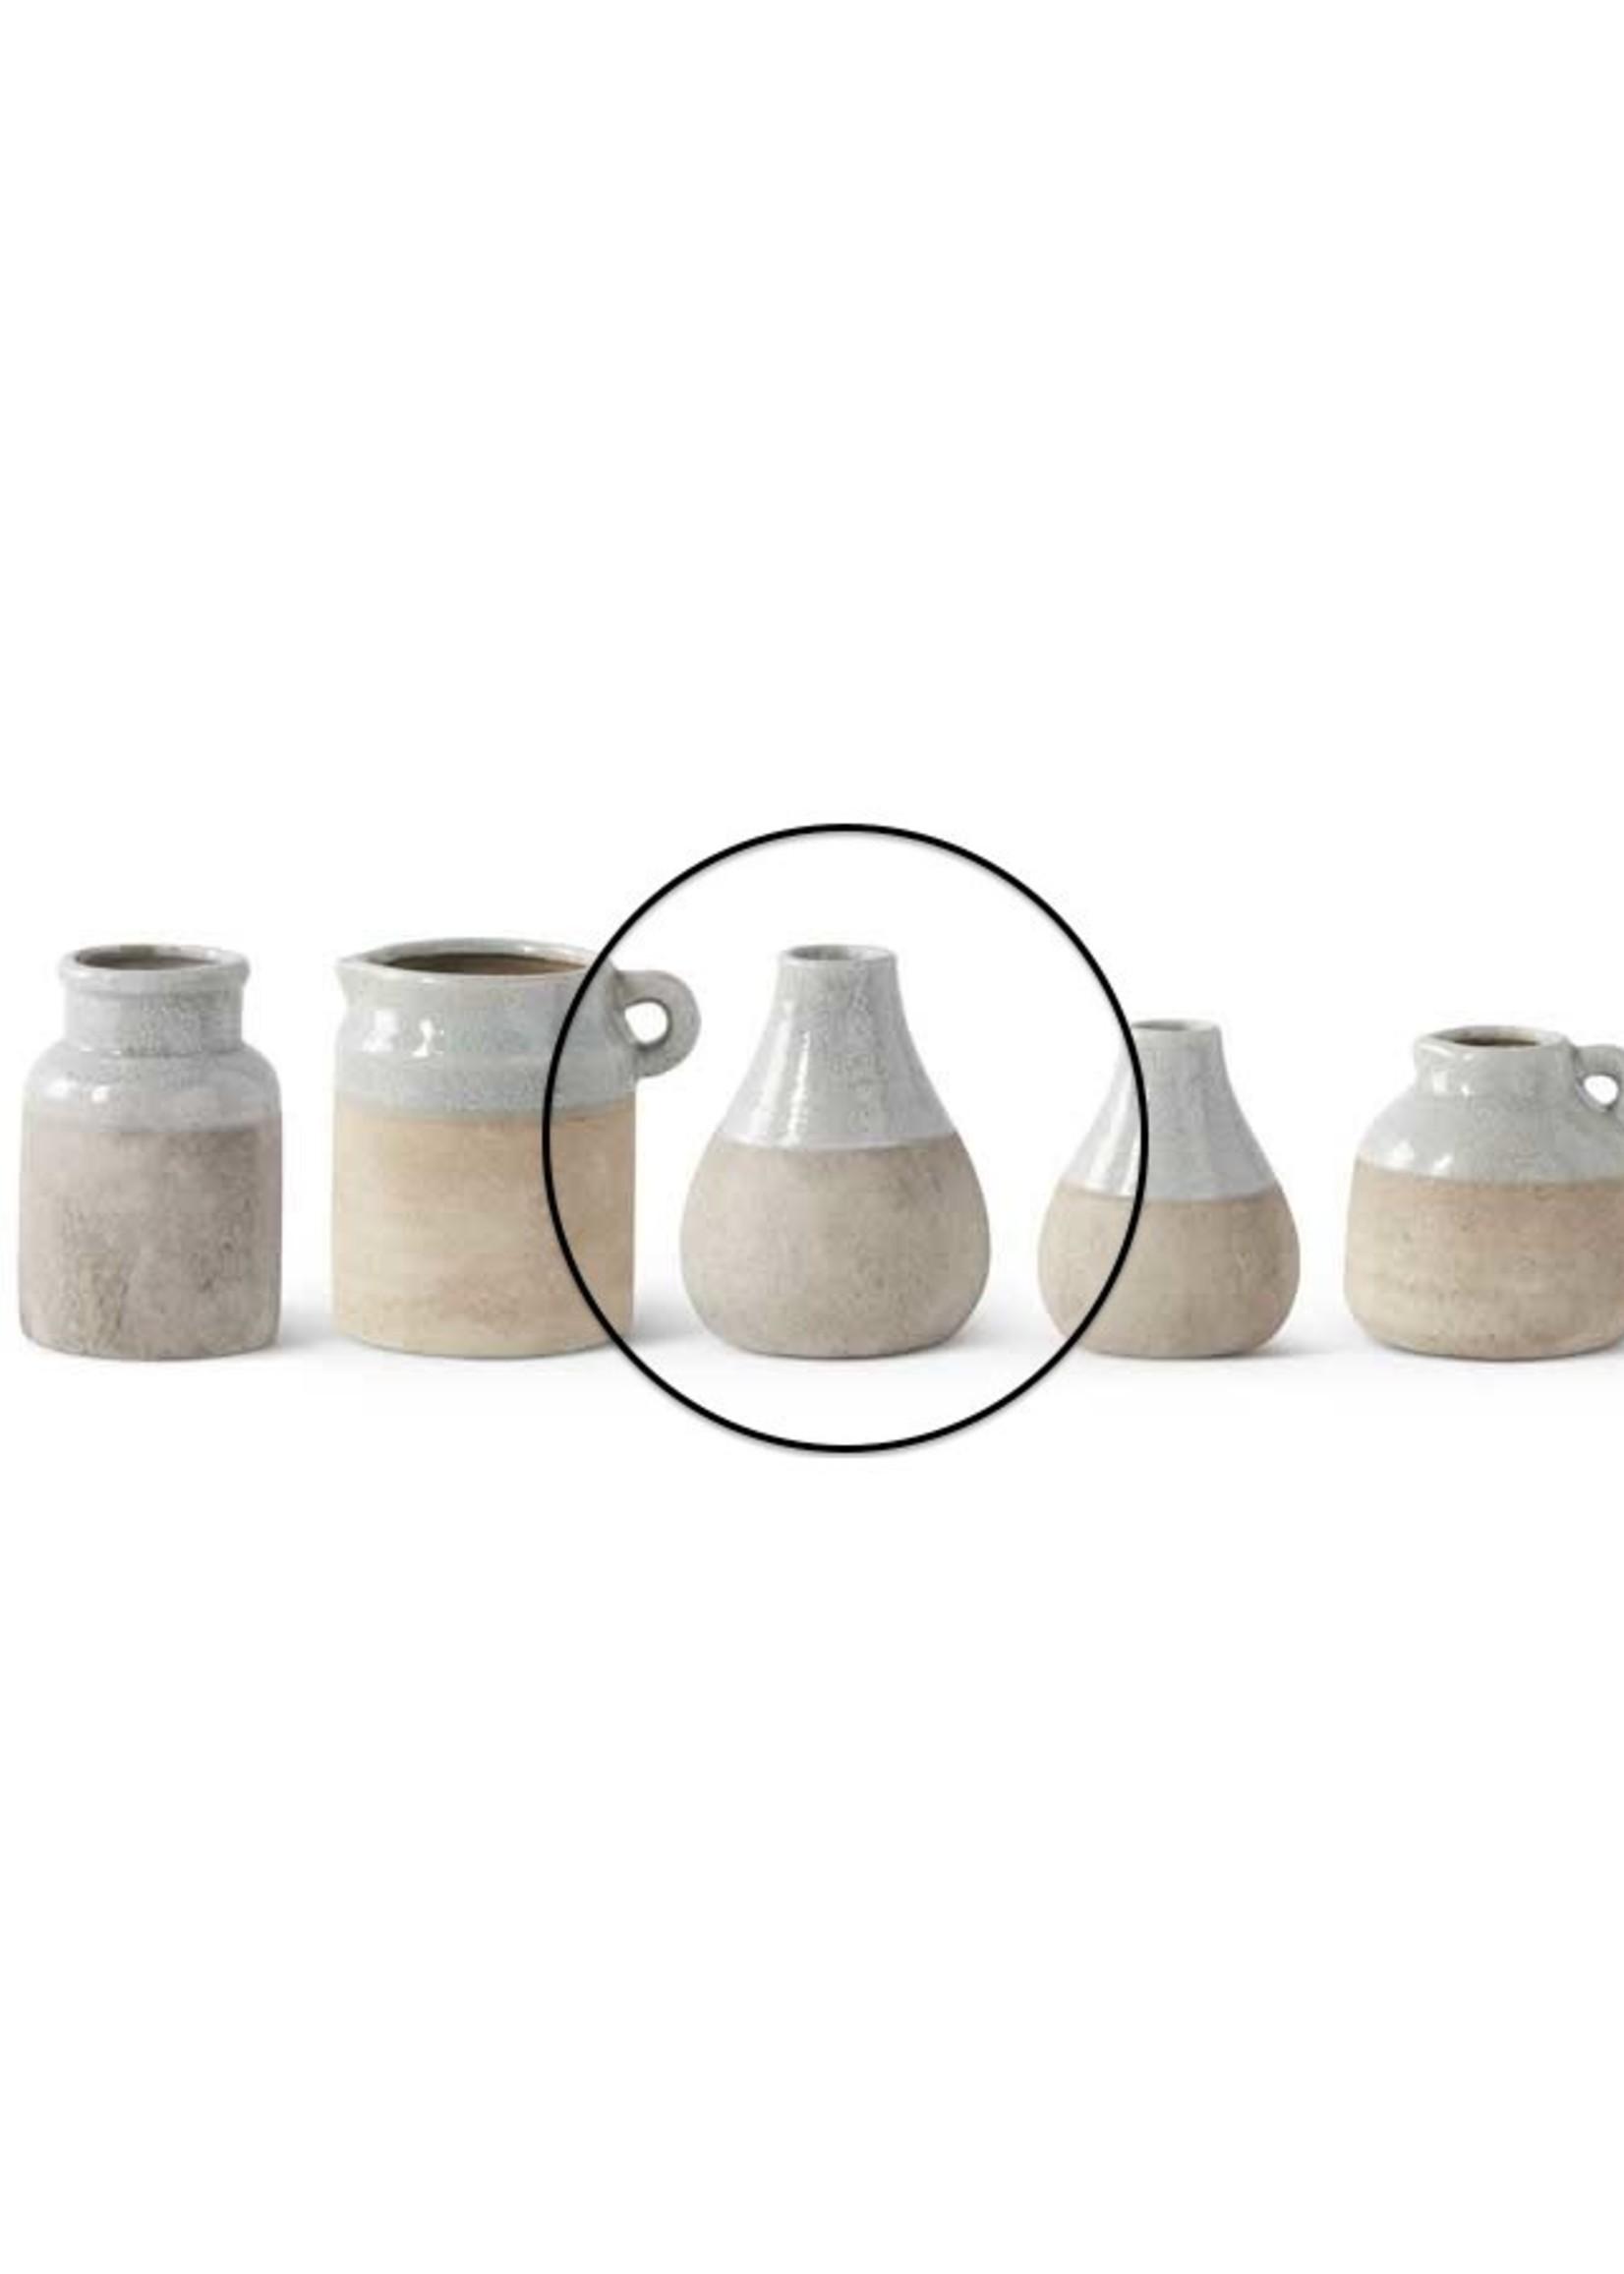 K & K Interiors 6 inch Ceramic Vase with Lt. Blue Top